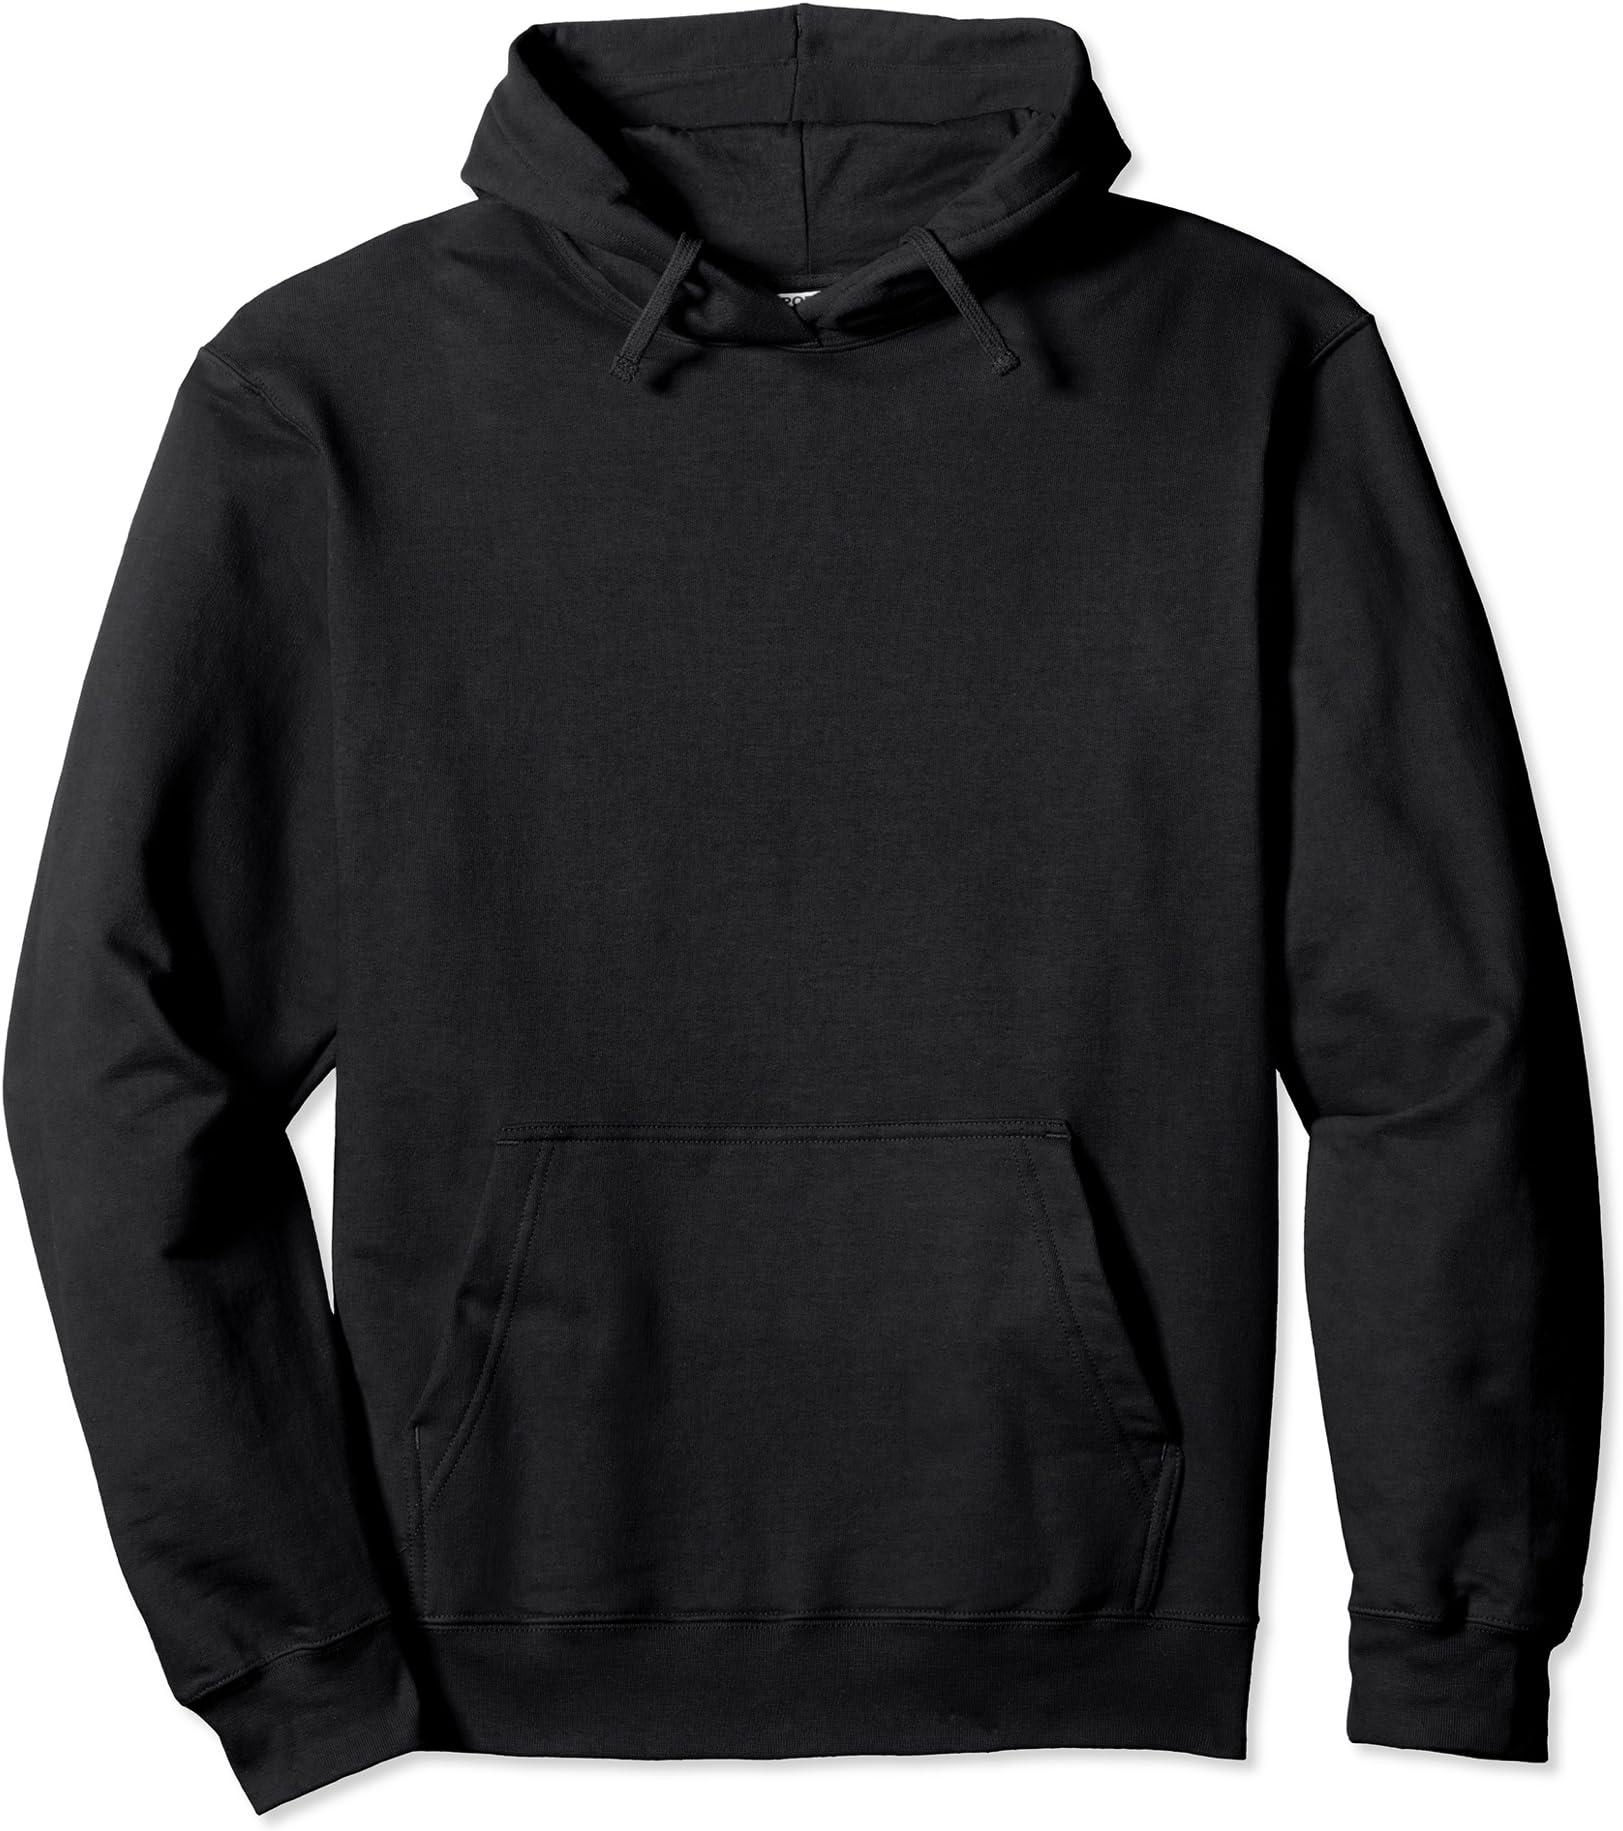 Short Sleeves Shirt Sweatshirt For Mens Womens Ladies Kids. Funny Art Supplies Painting Paintbrush Tshirt For Artists Unisex Hoodie